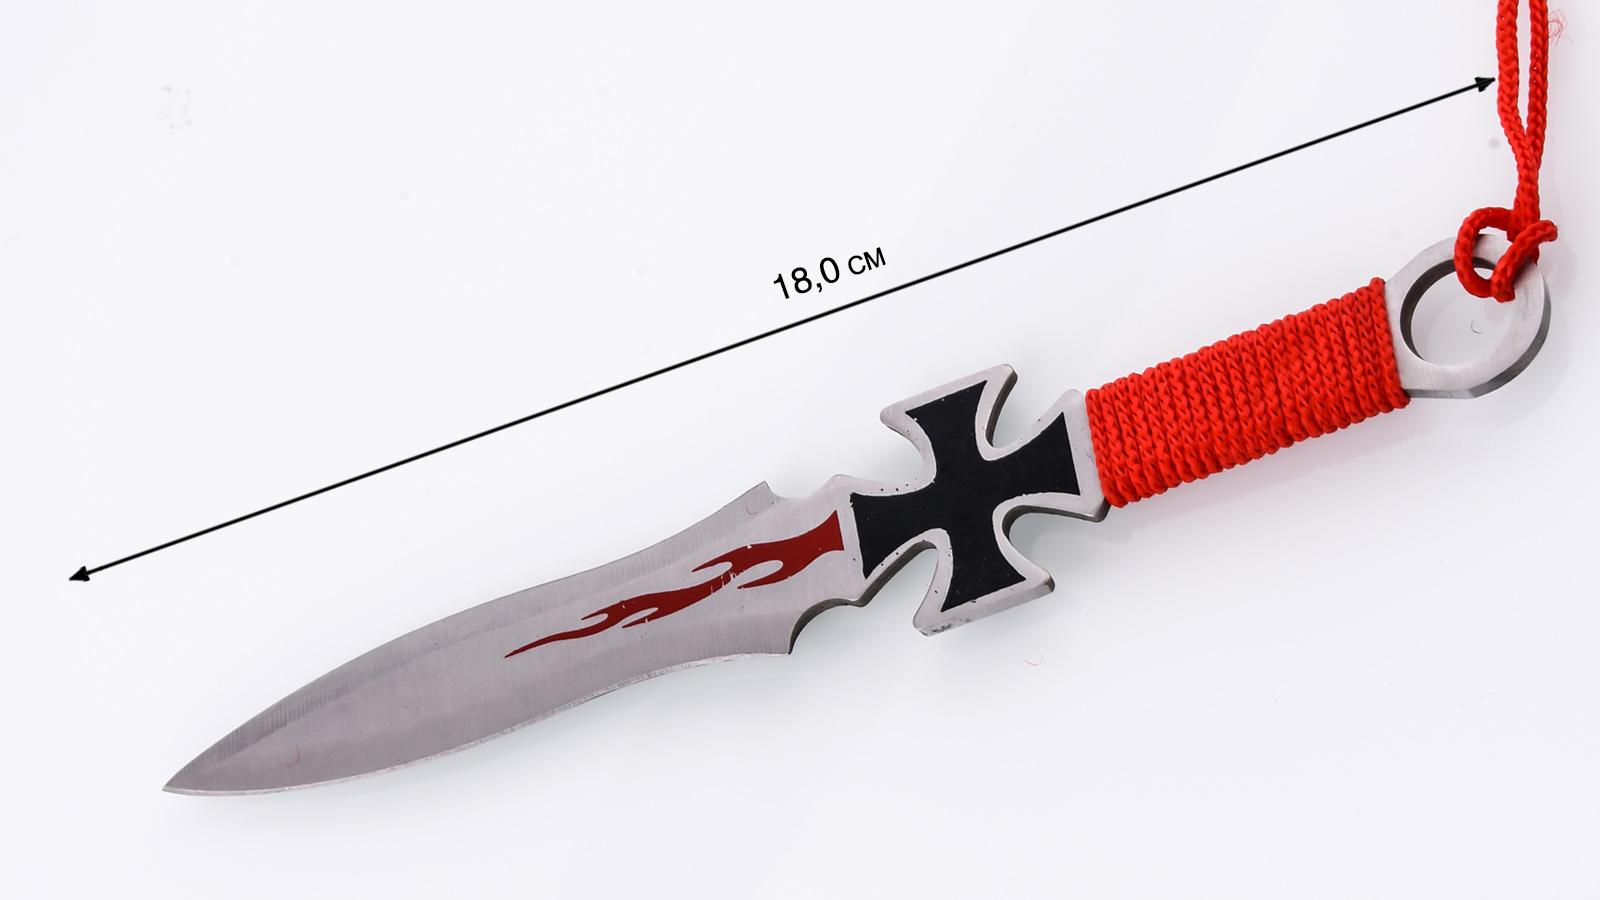 Купить ножи Perfect Point PP-020-3 в военторге Военпро